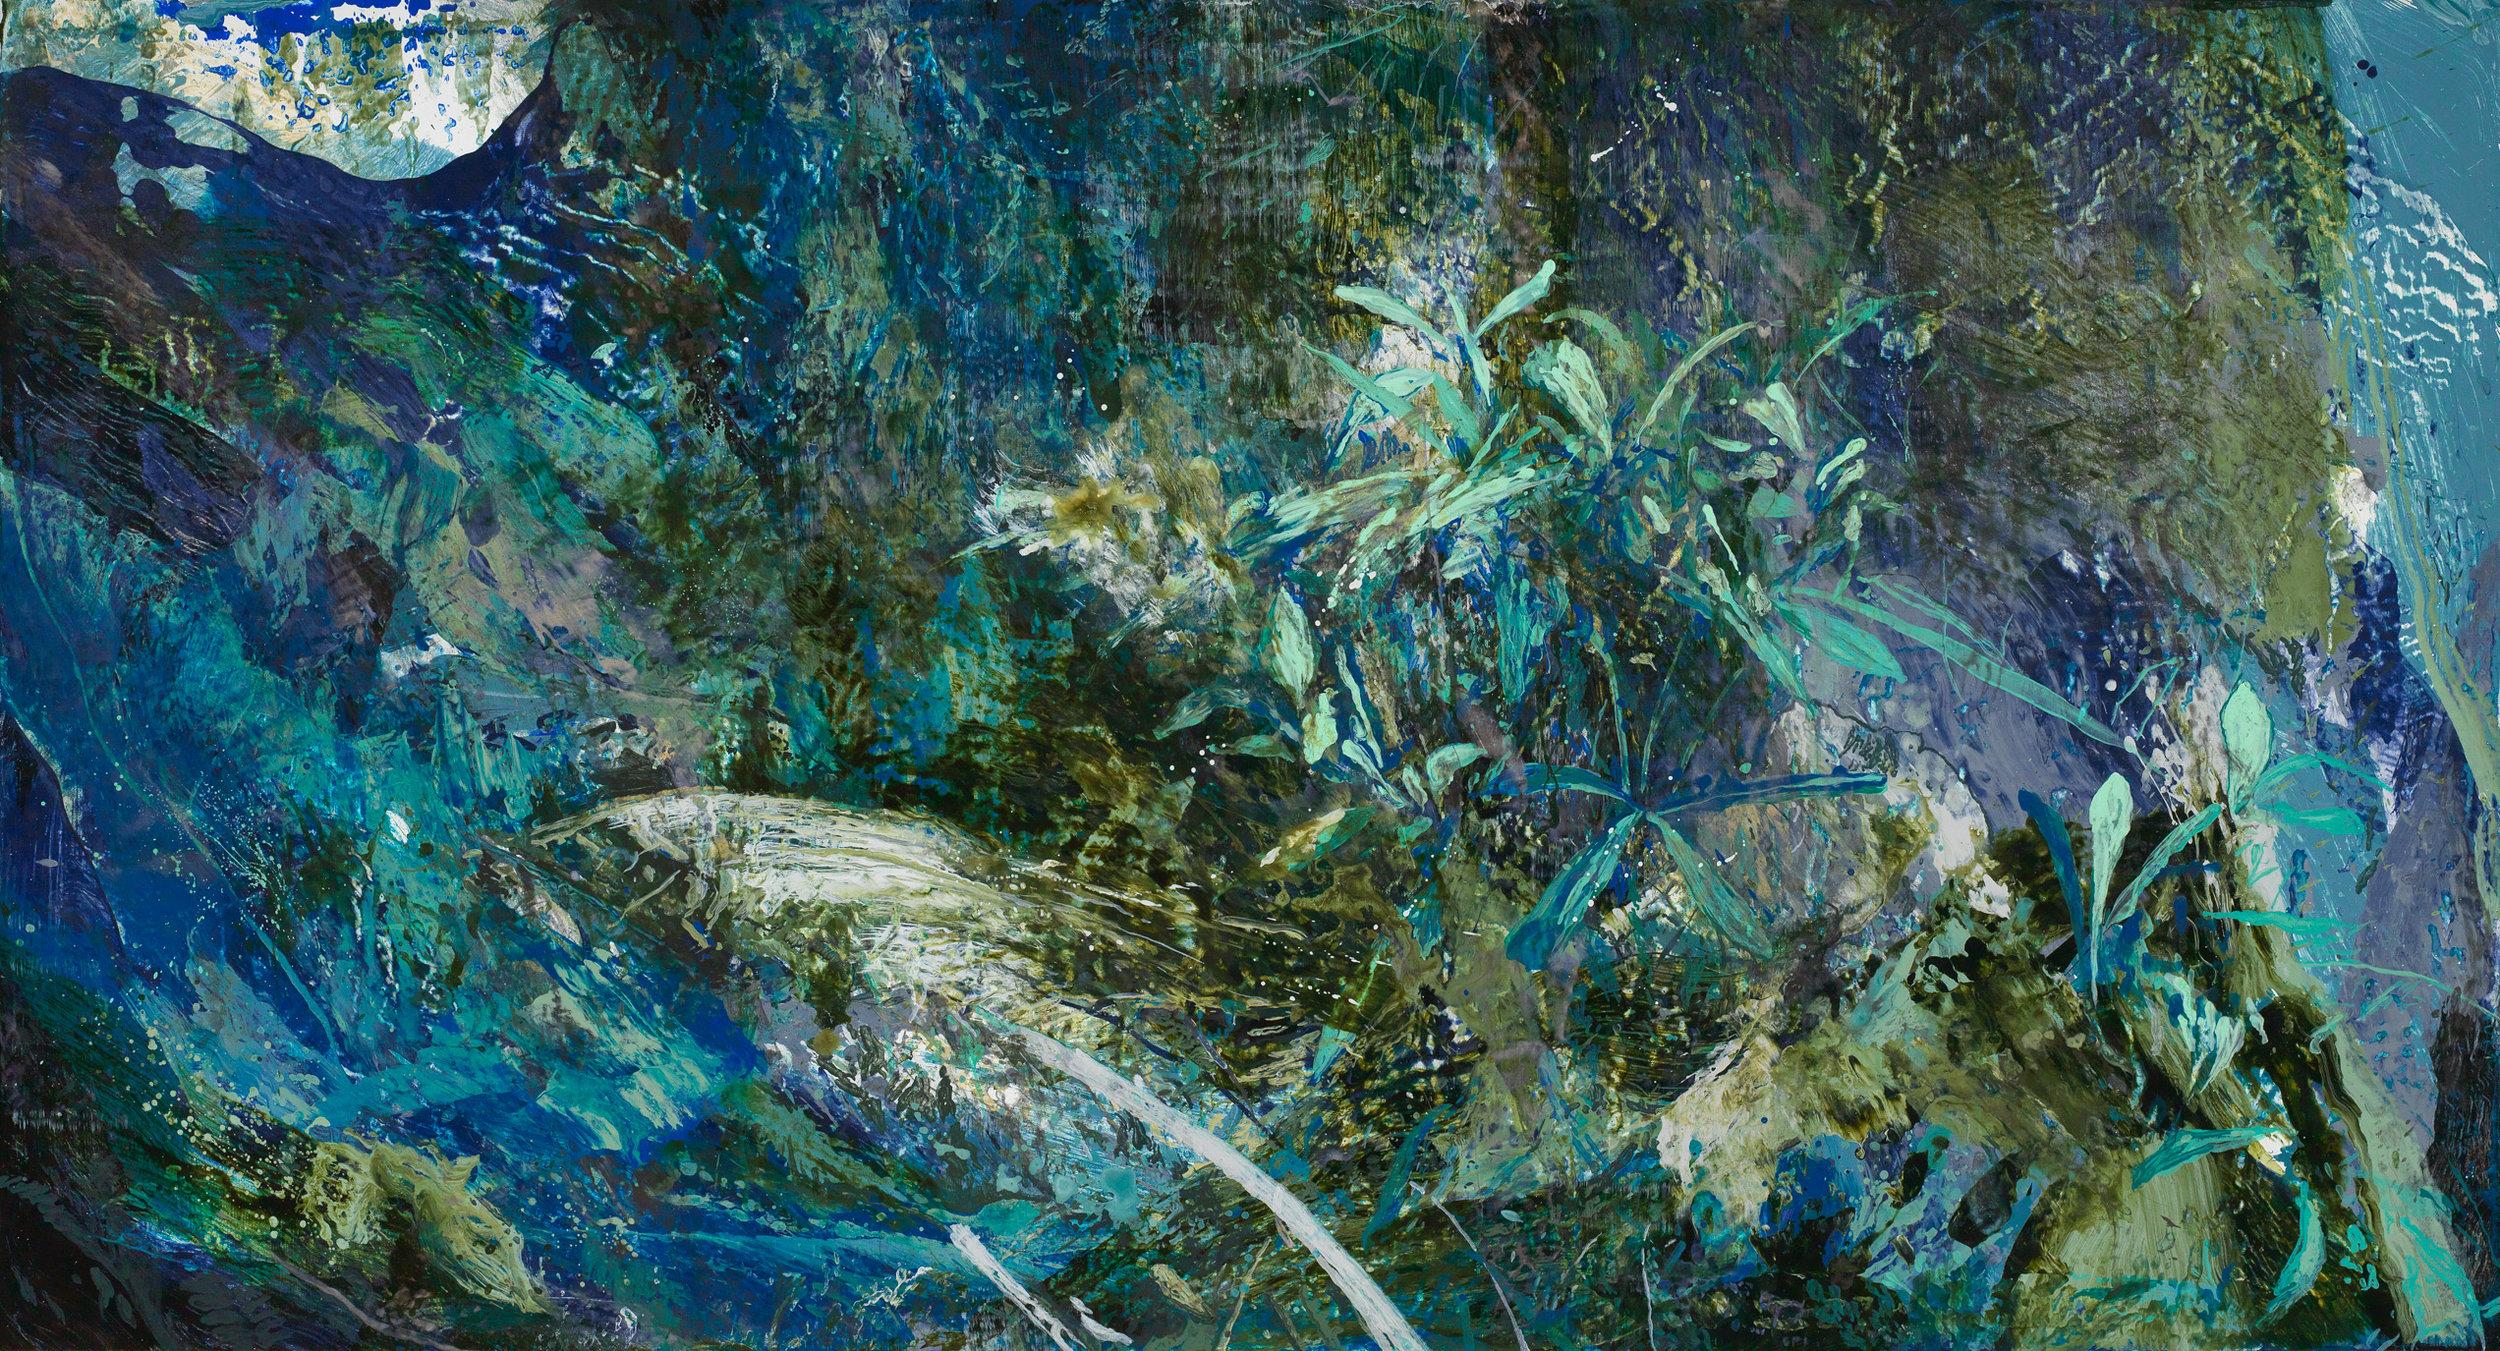 Forest #9 | 森林#9, 2016, Acrylic on Canvas, 80 x 150 cm, SHIU Sheng Hung | 許聖泓 , Image 1/2